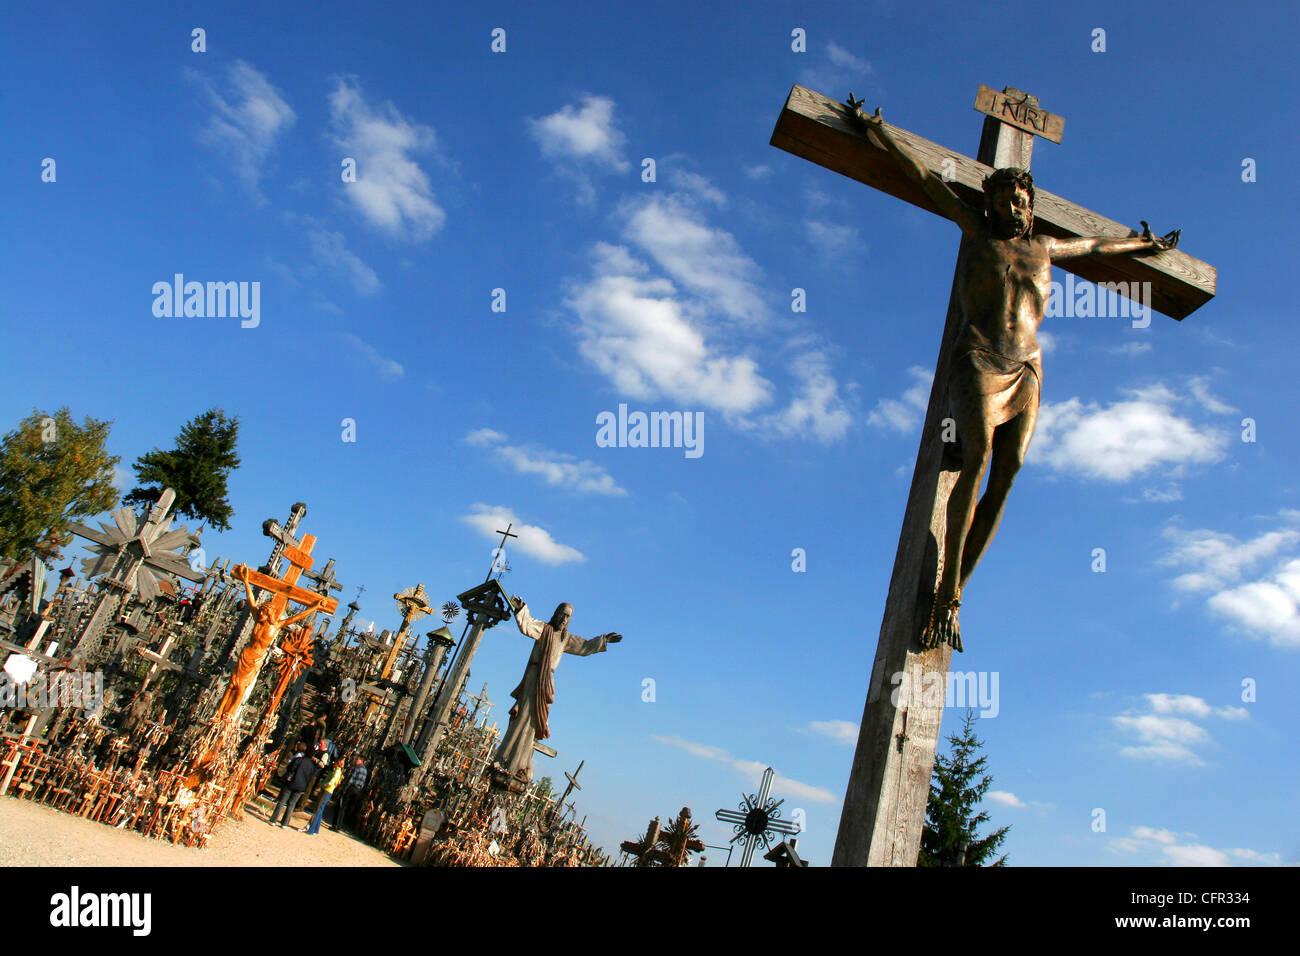 Colina de Las Cruces. Lituania. Stock Photo